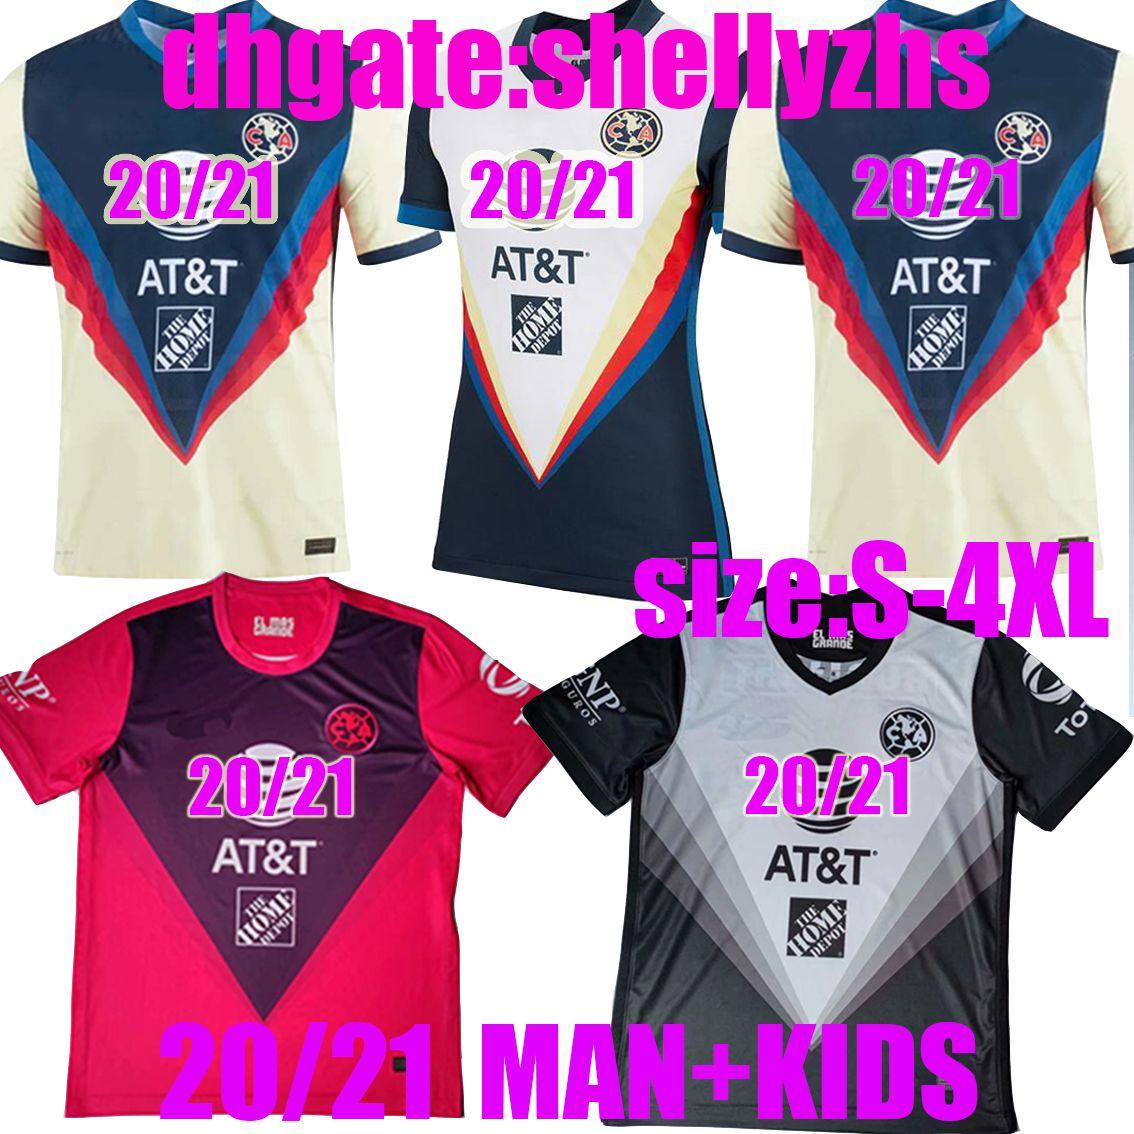 Size: S-4XL 2020 2021 Liga MX Club Club America Soccer Jersey 20 21 Молодежь Мексика Джовани Р. Самбуэза О.Перальта Футбольная футболка Мужчины + Дети